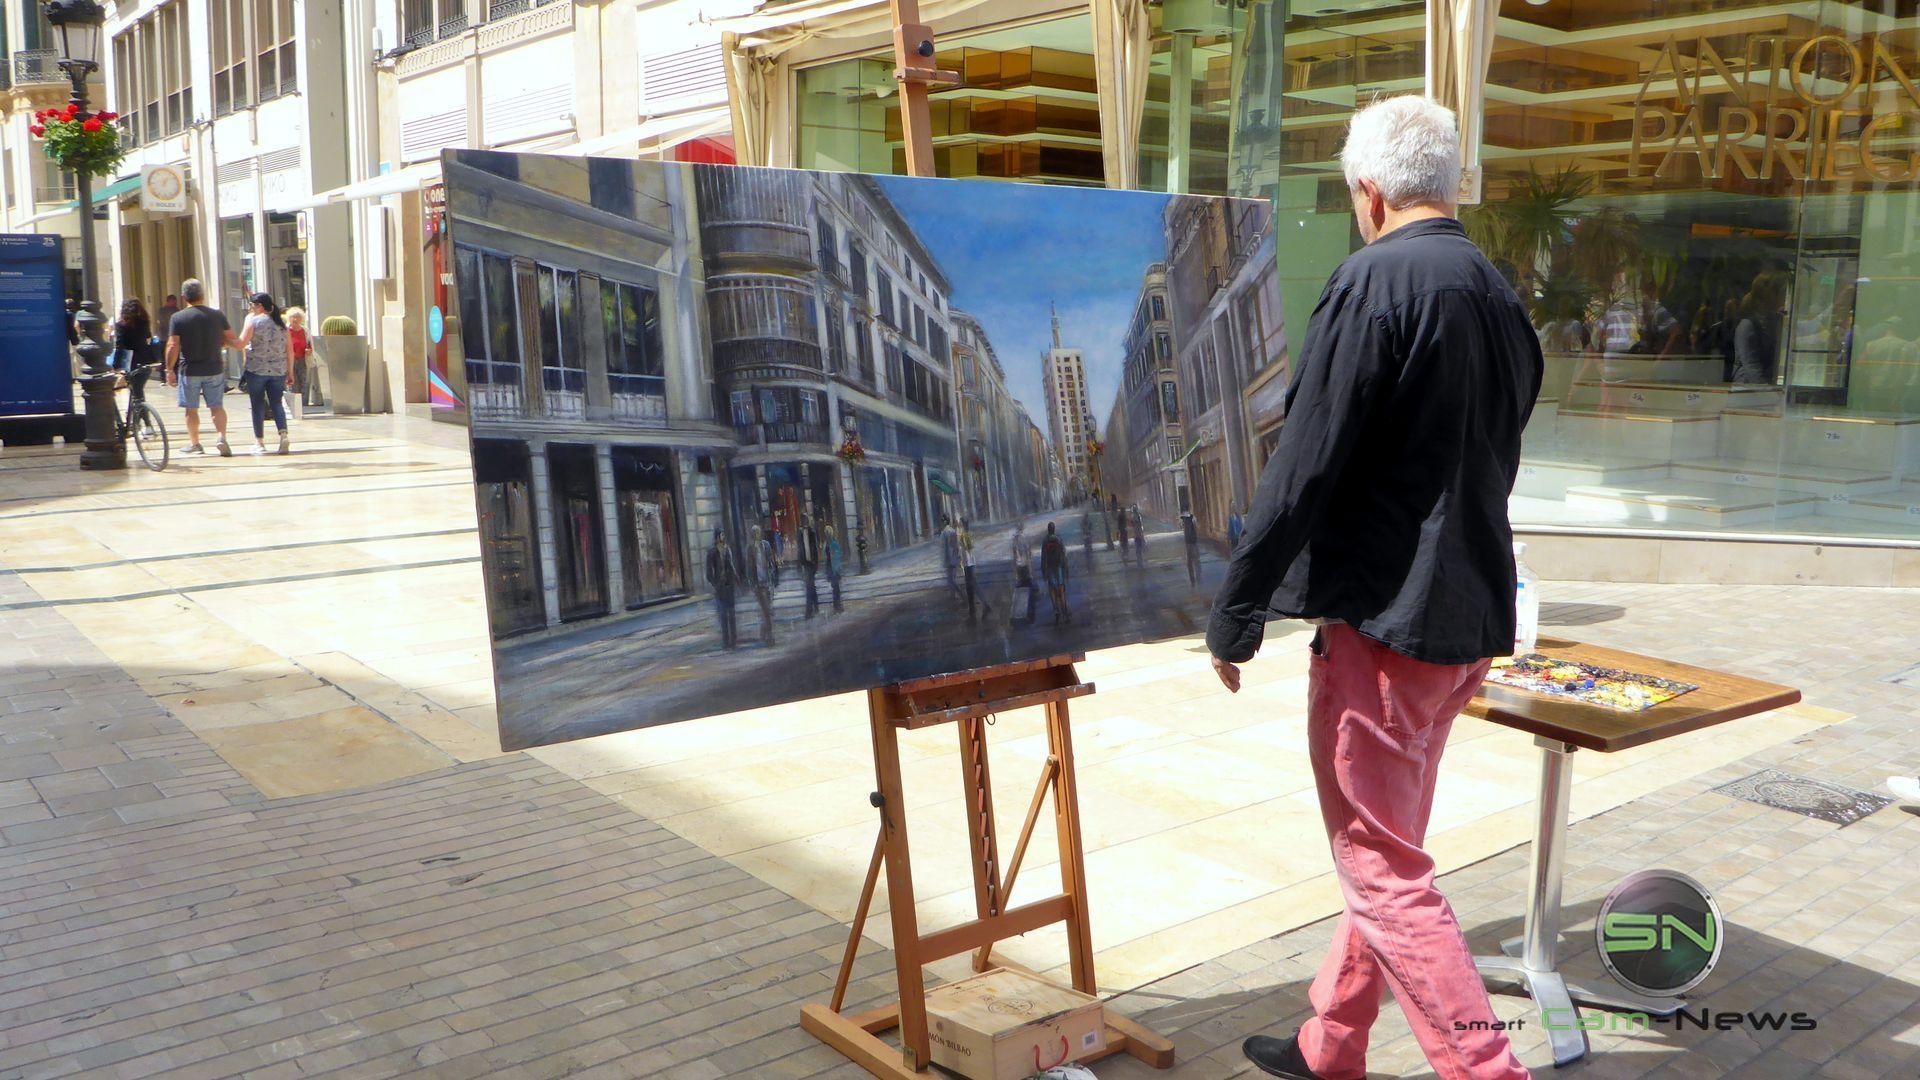 Straßenkünstler Barcelona - Panasonic FT5 - SmartCamNews